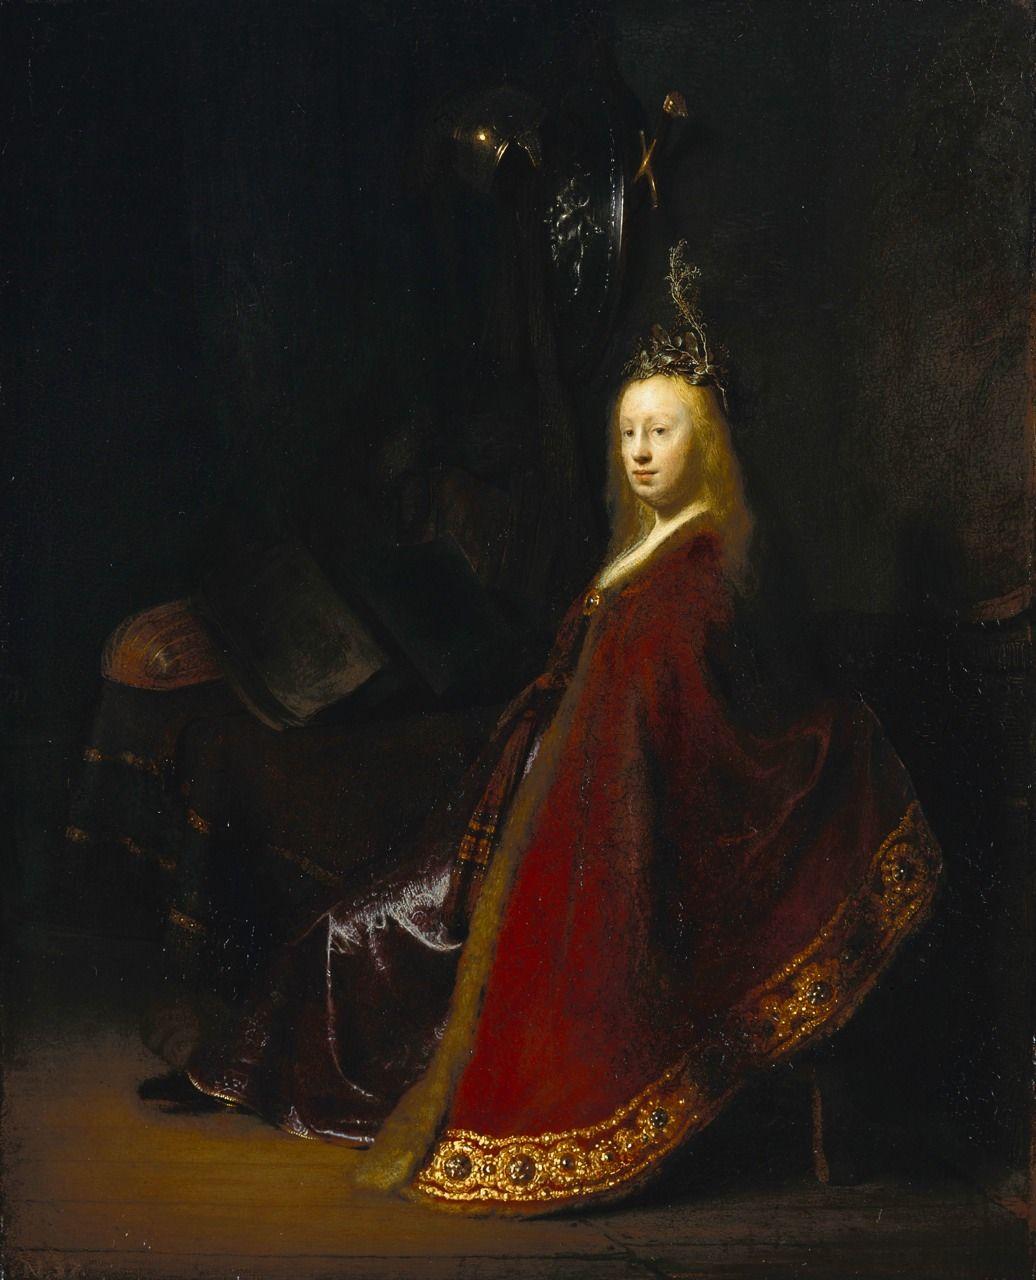 Minerva by Rembrandt Harmenszoon van Rijn 1631